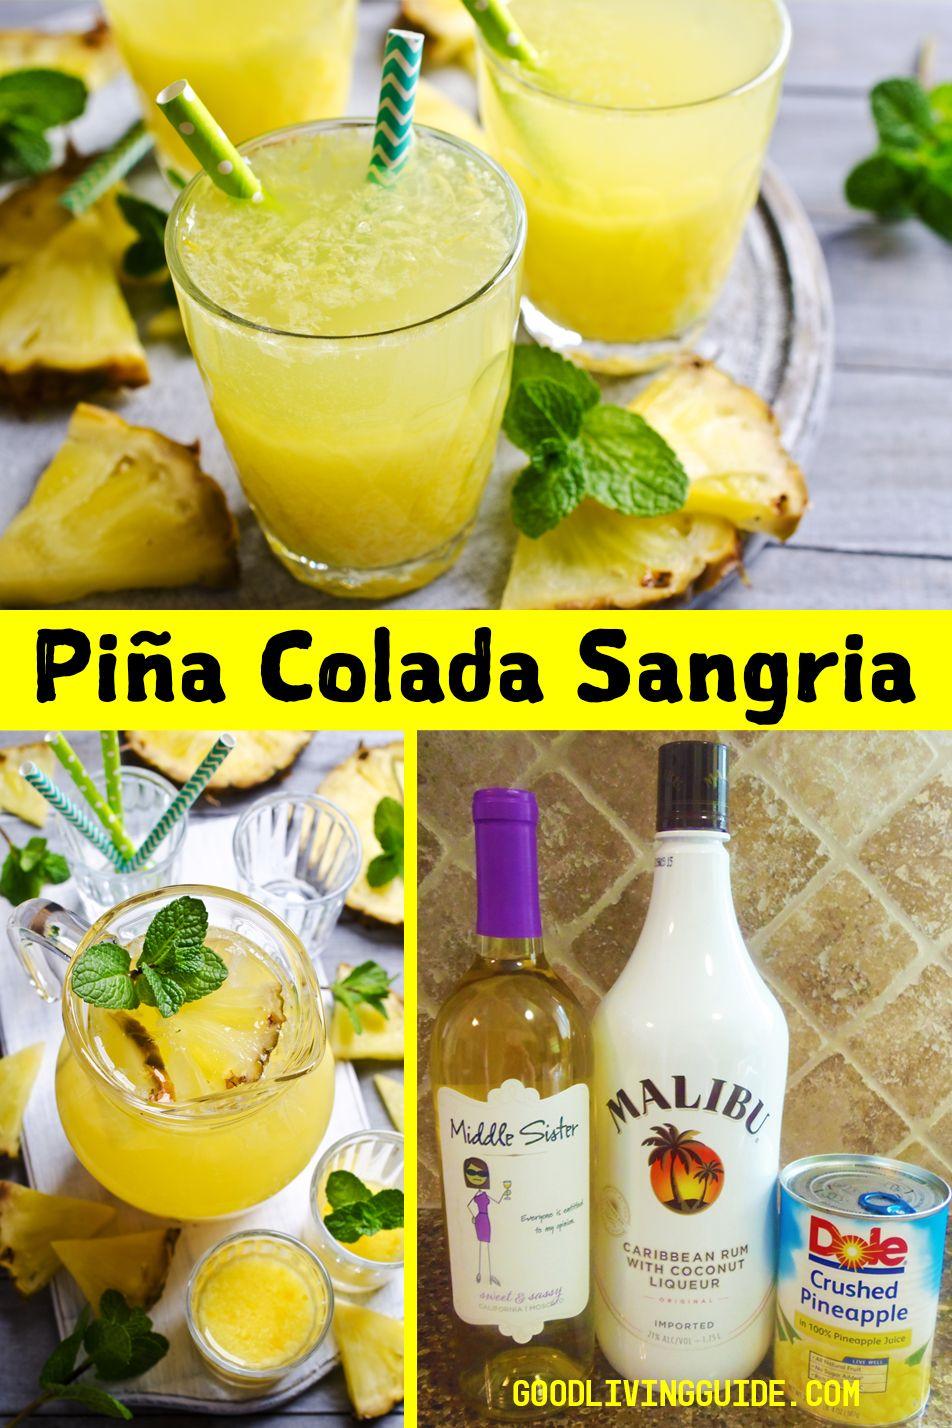 PIÑA COLADA SANGRIA